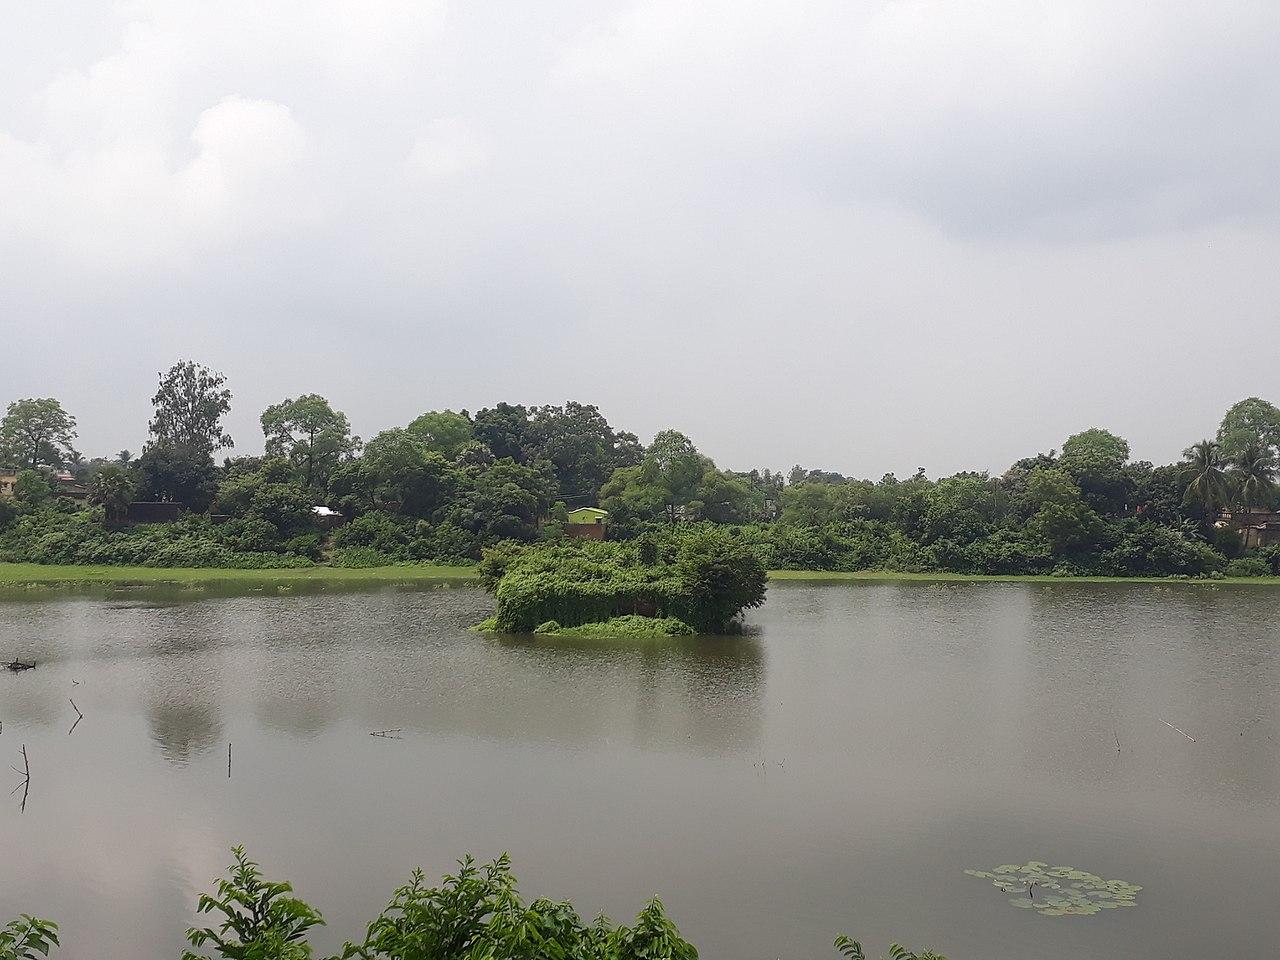 Rajnagar Kalidaha